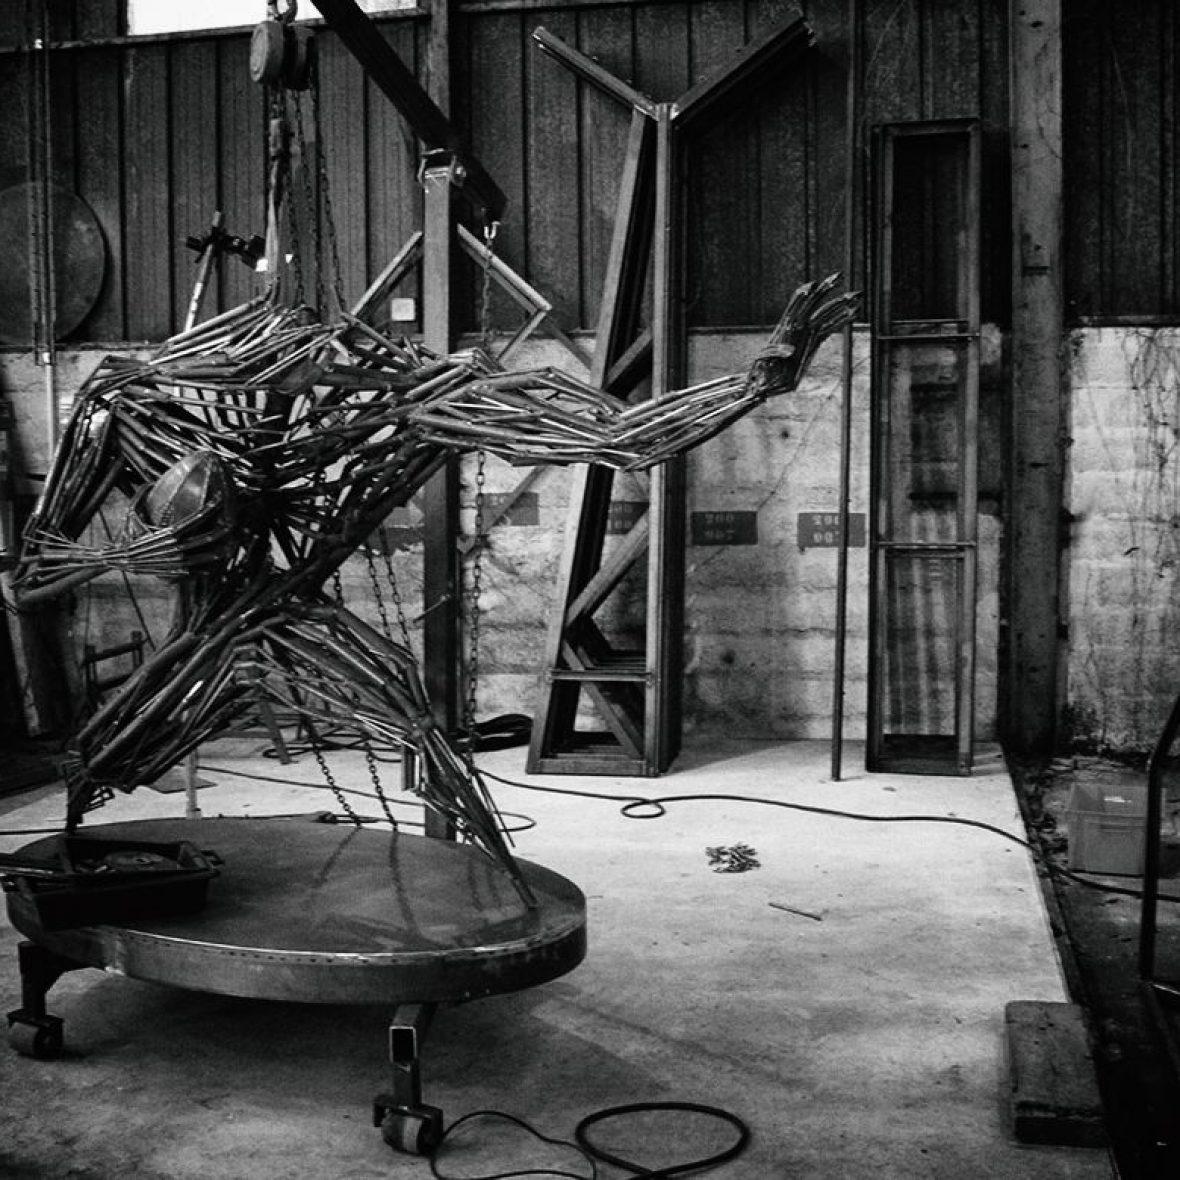 Création Sculpture Rugbyman Atelier Madneom Marans 2016